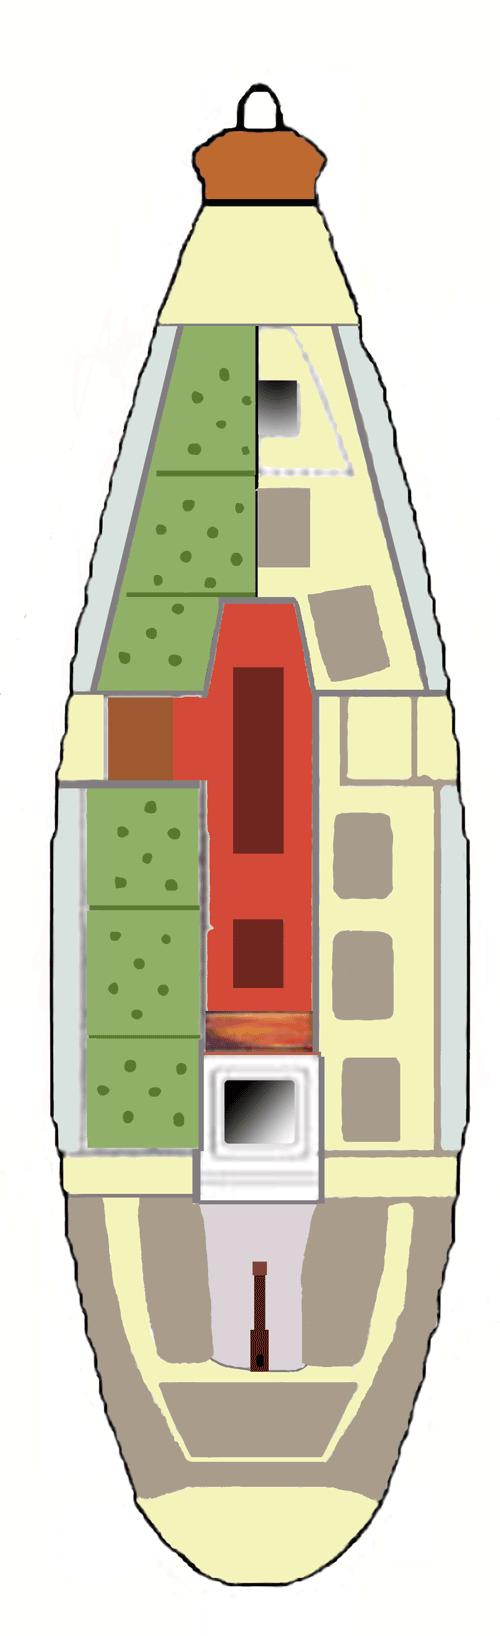 Sudar-layout